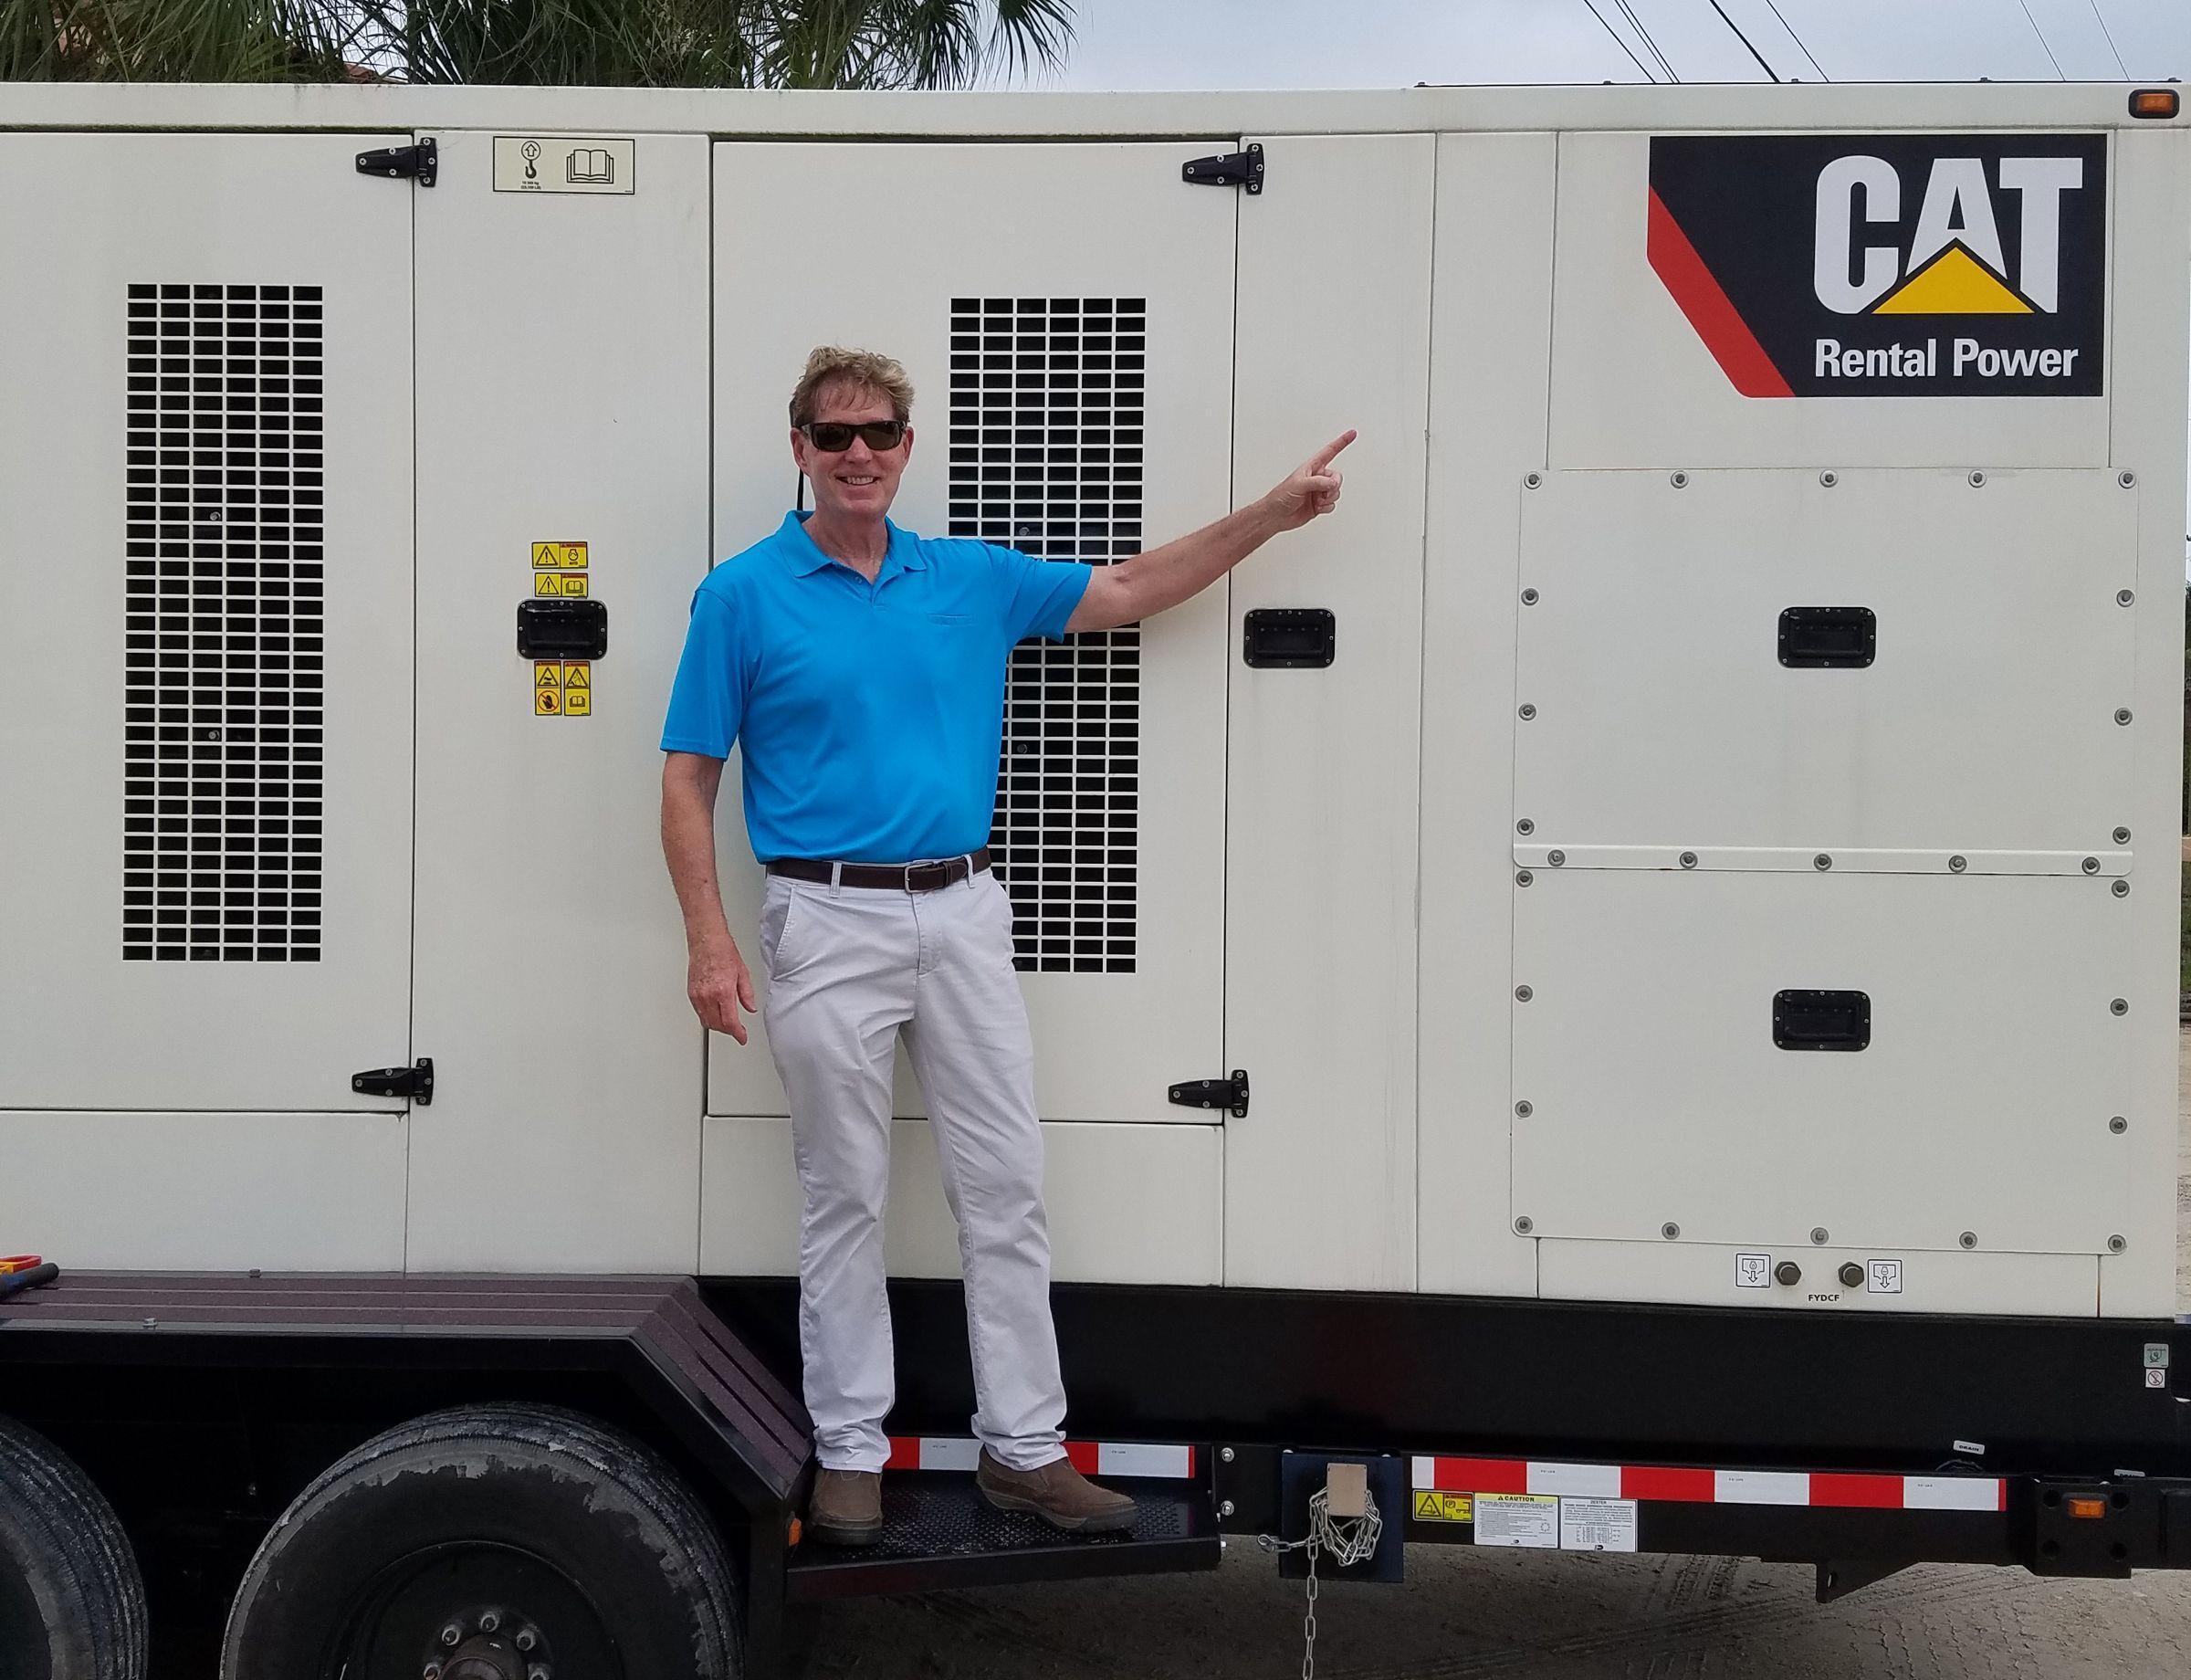 One month before Hurricane Matthew hit, Cat Dealer Ring Power installed a rental generator at La Fiesta Ocean Inn.